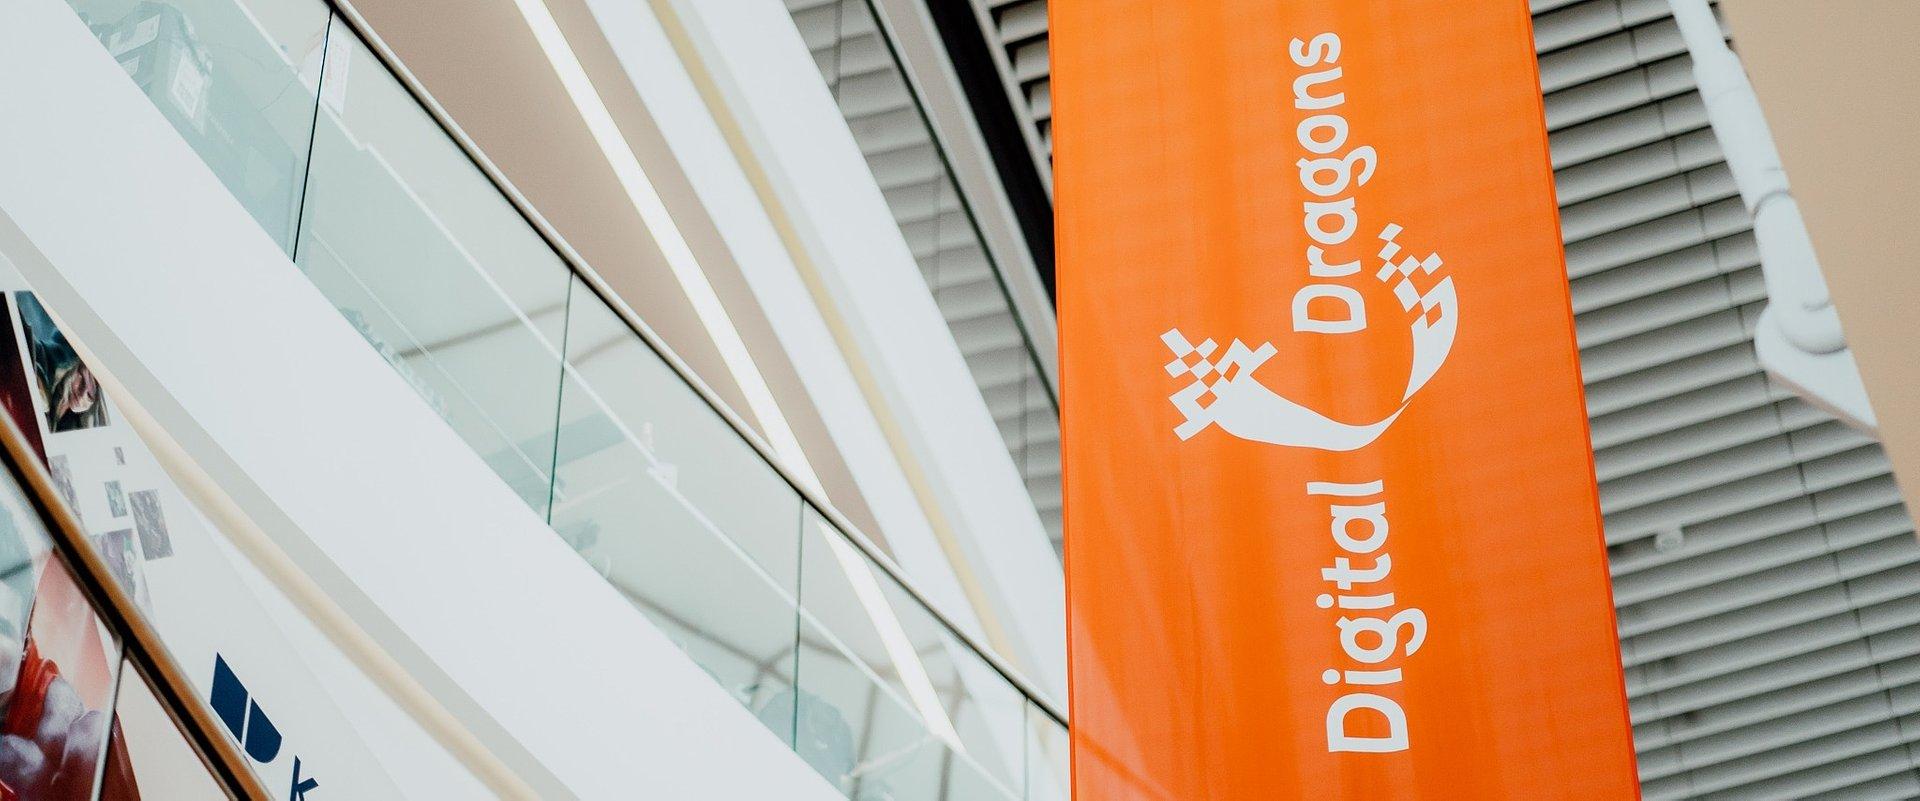 Digital Dragons 2020 online